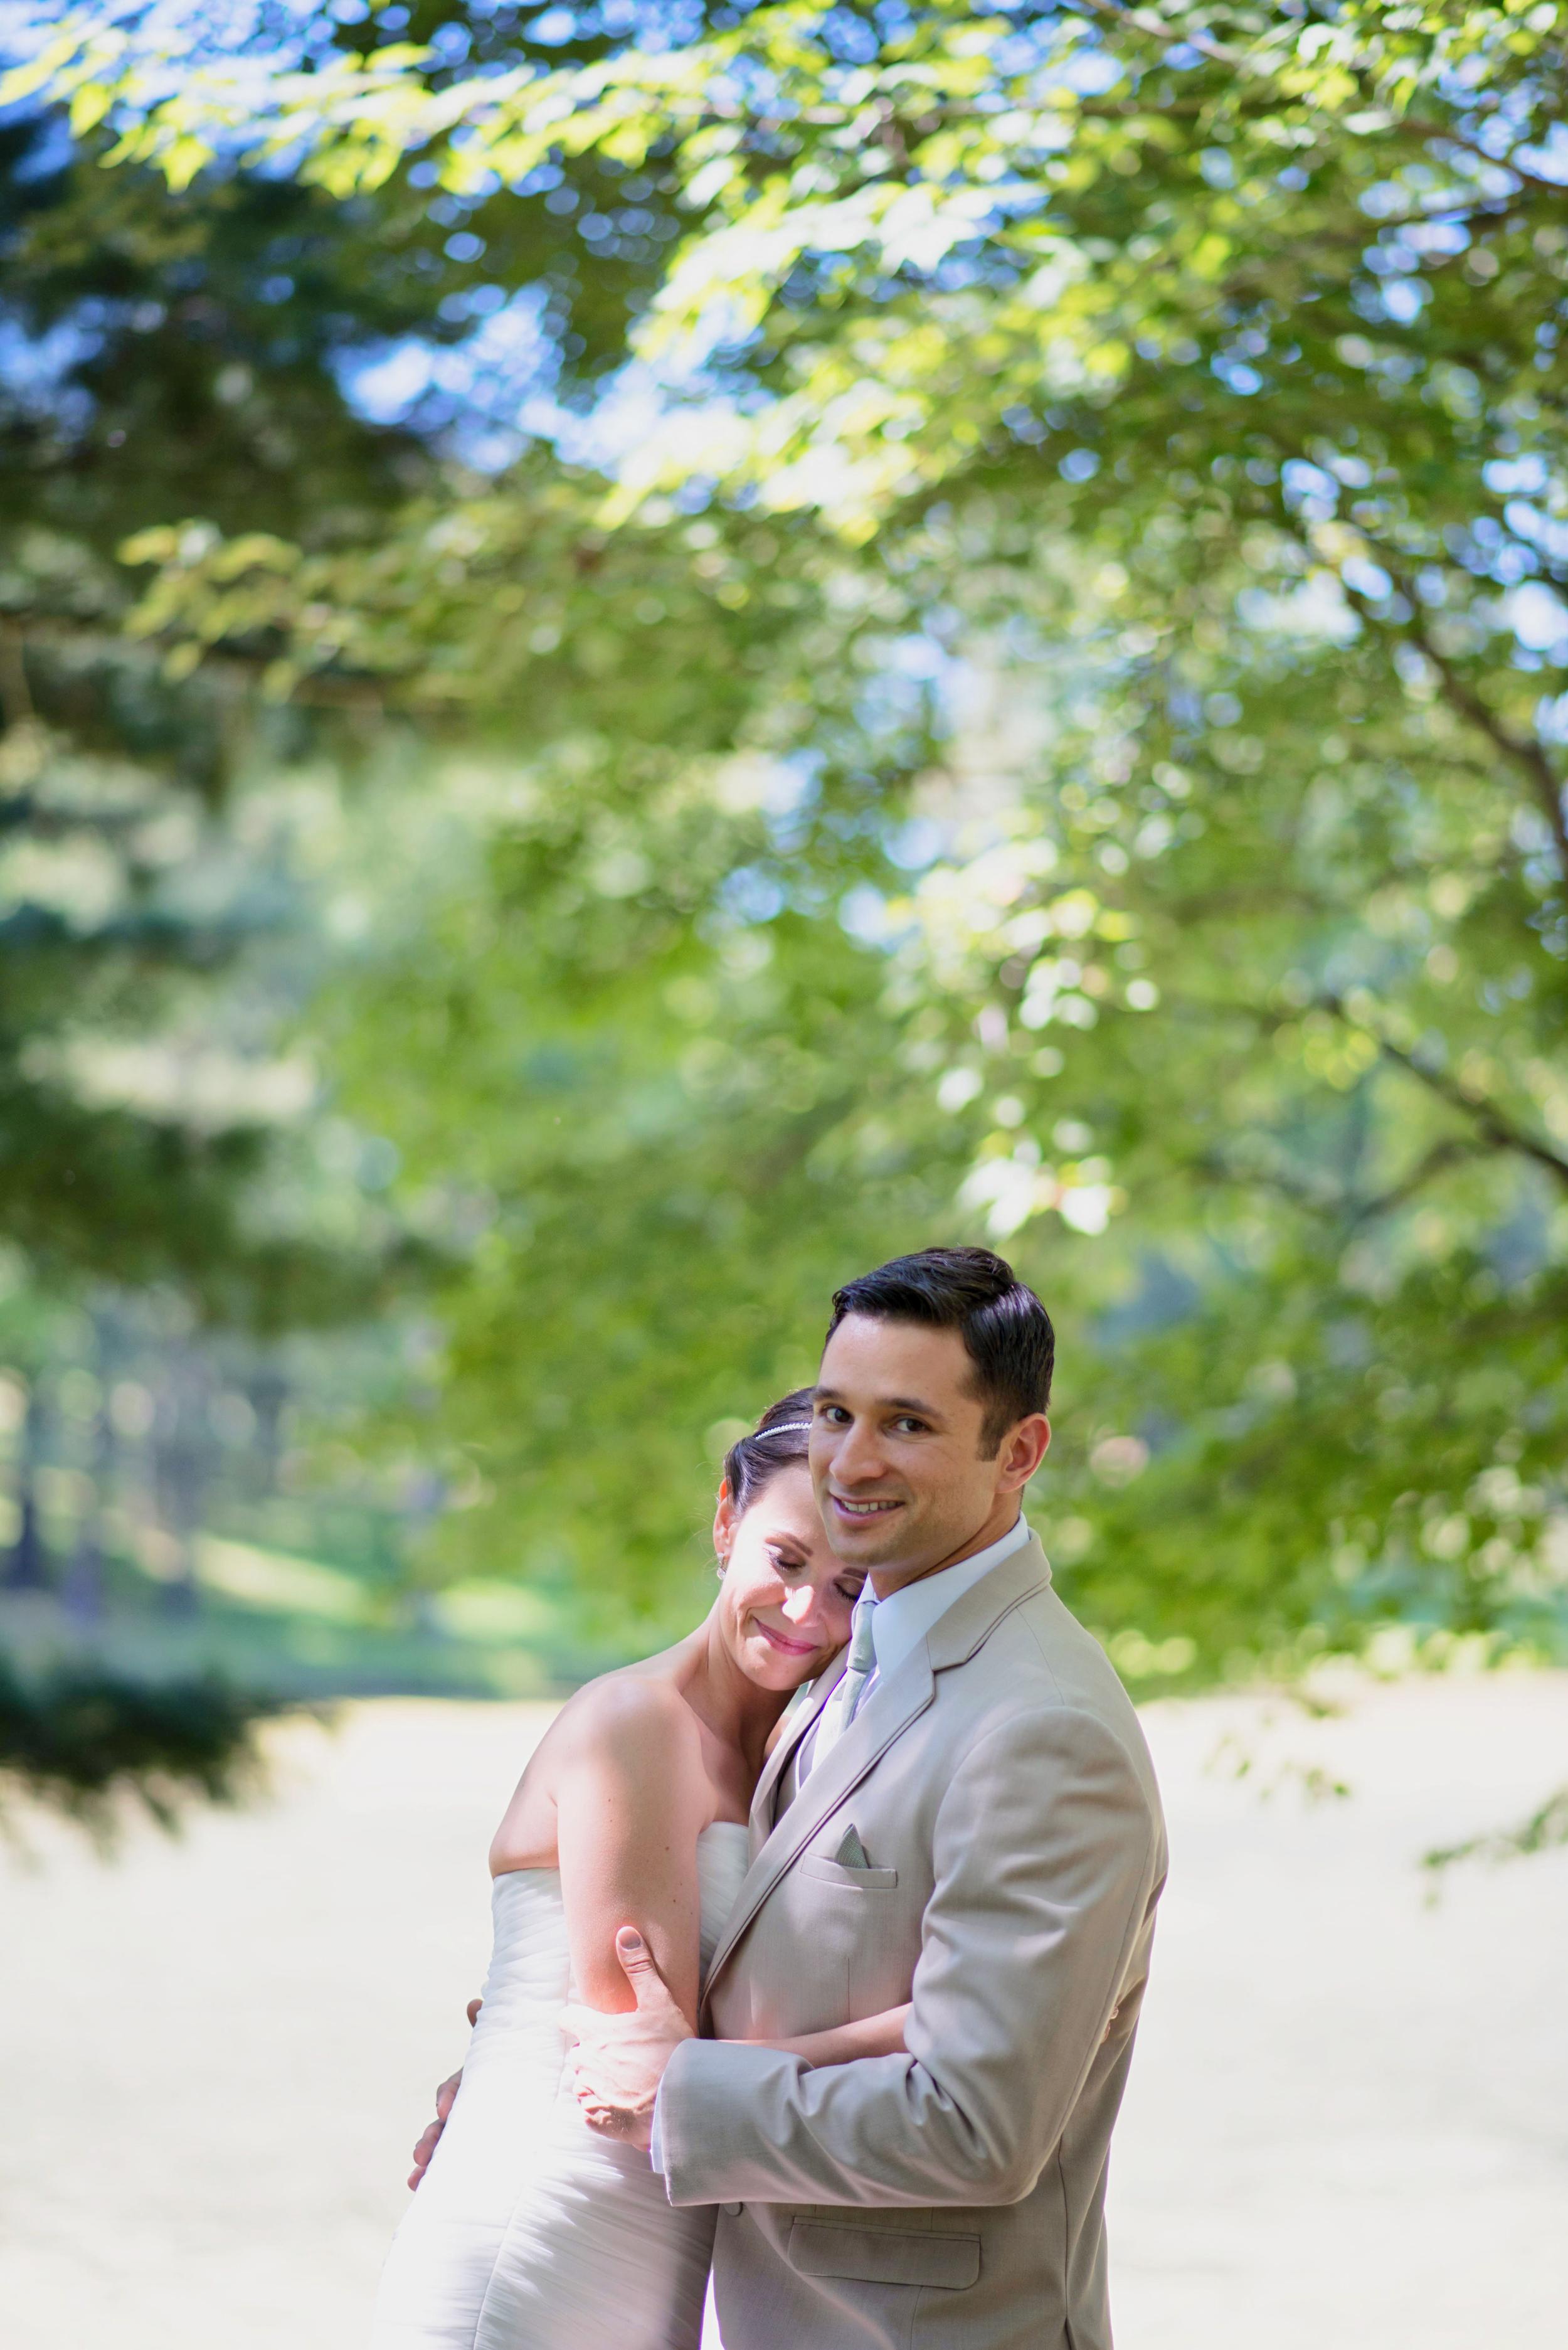 Matt_Swetel_Photography_Erin_and_Jeff_married020.jpg